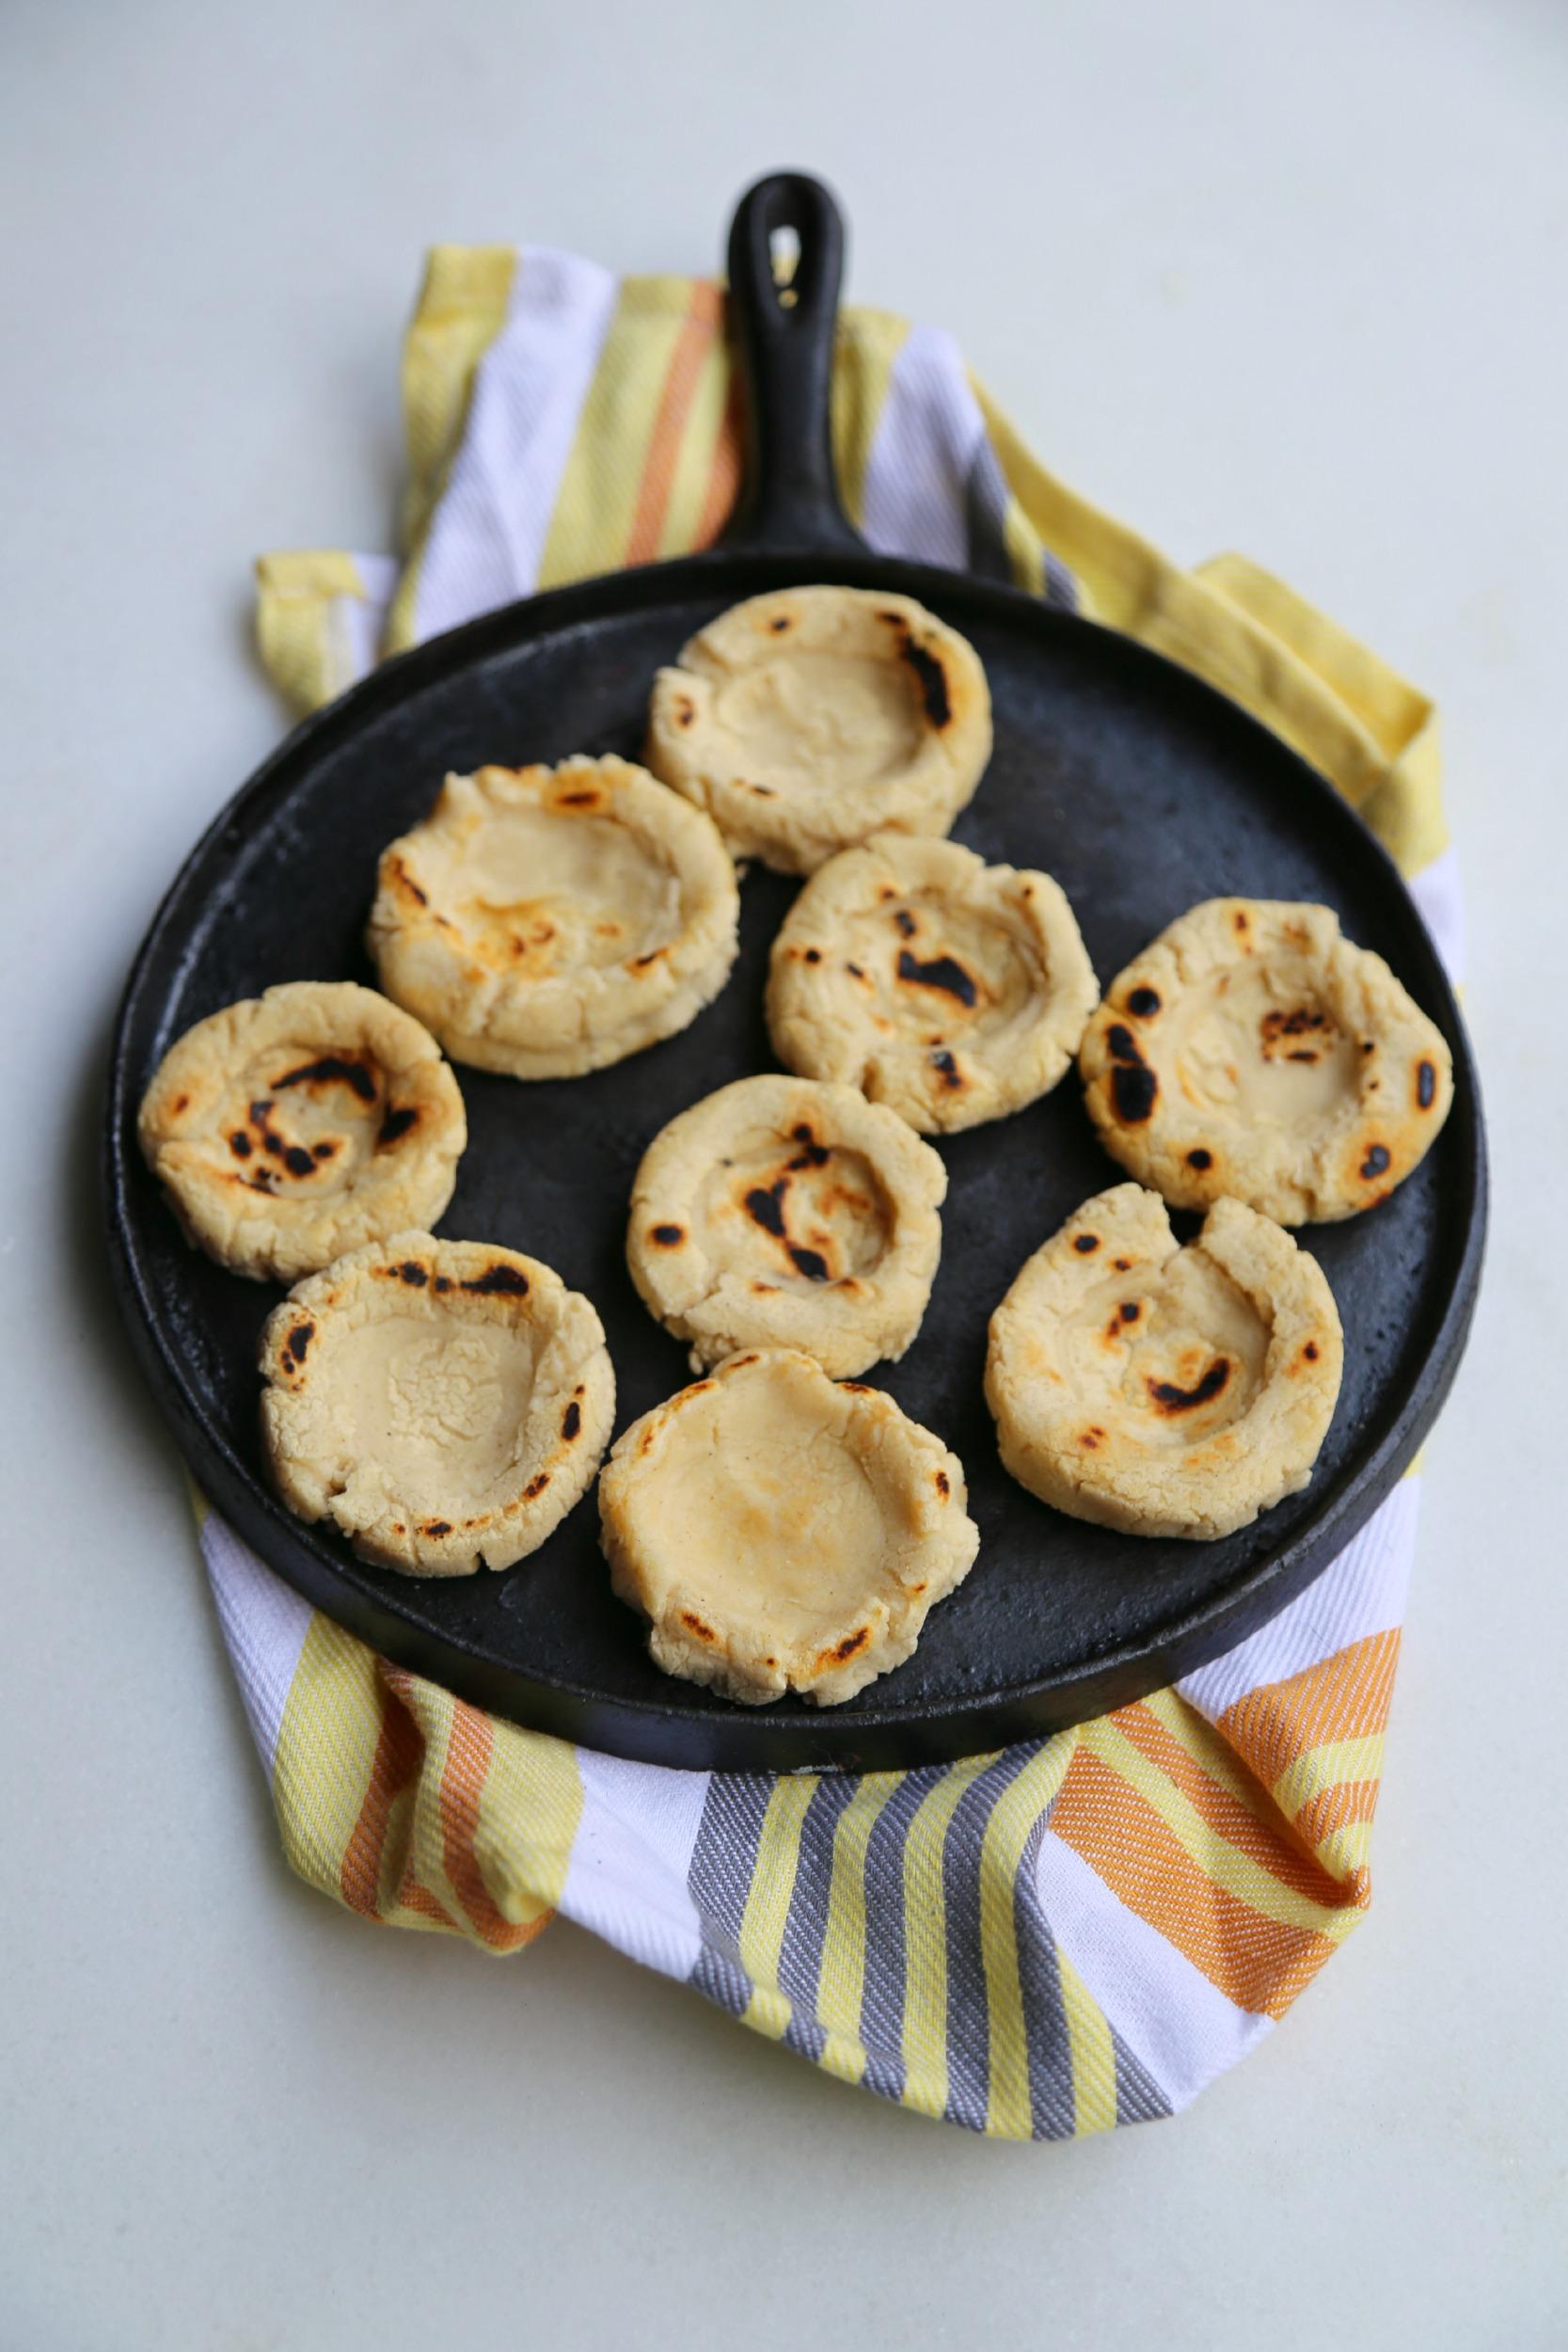 easy-to-make-sopes-vianneyrodriguez-sweetlifebake